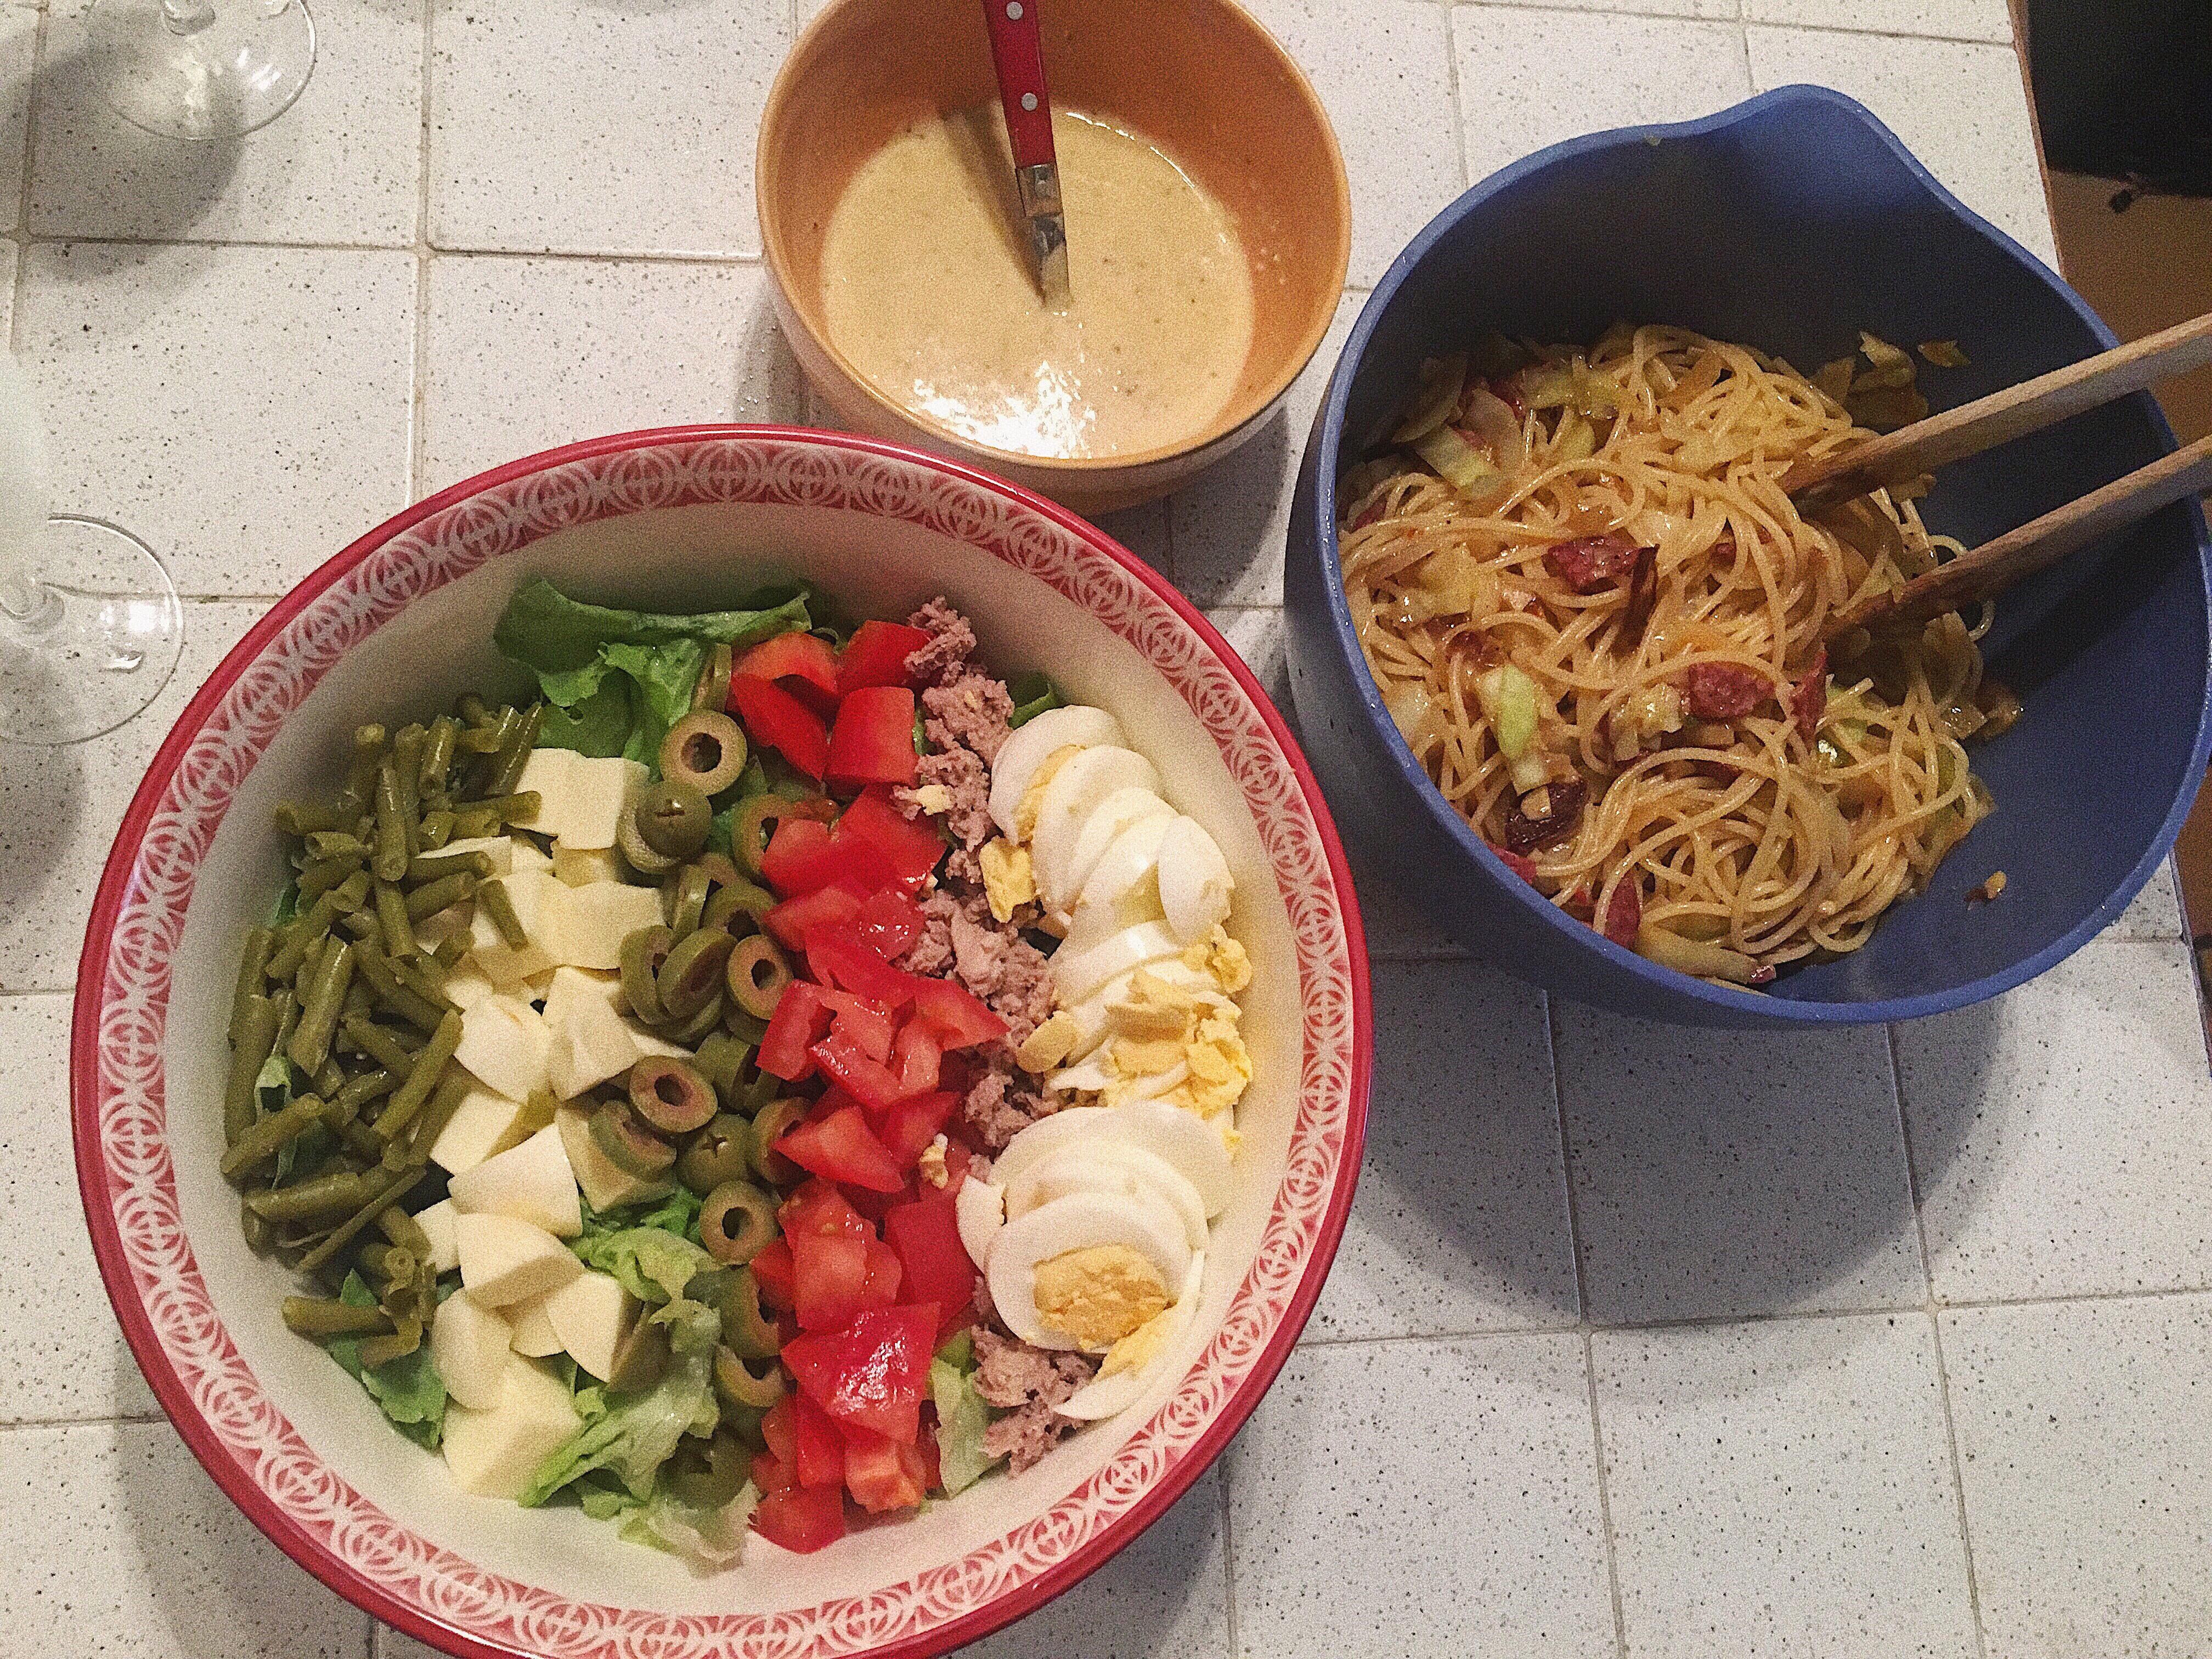 La salade niçoise.(ニース風サラダ)